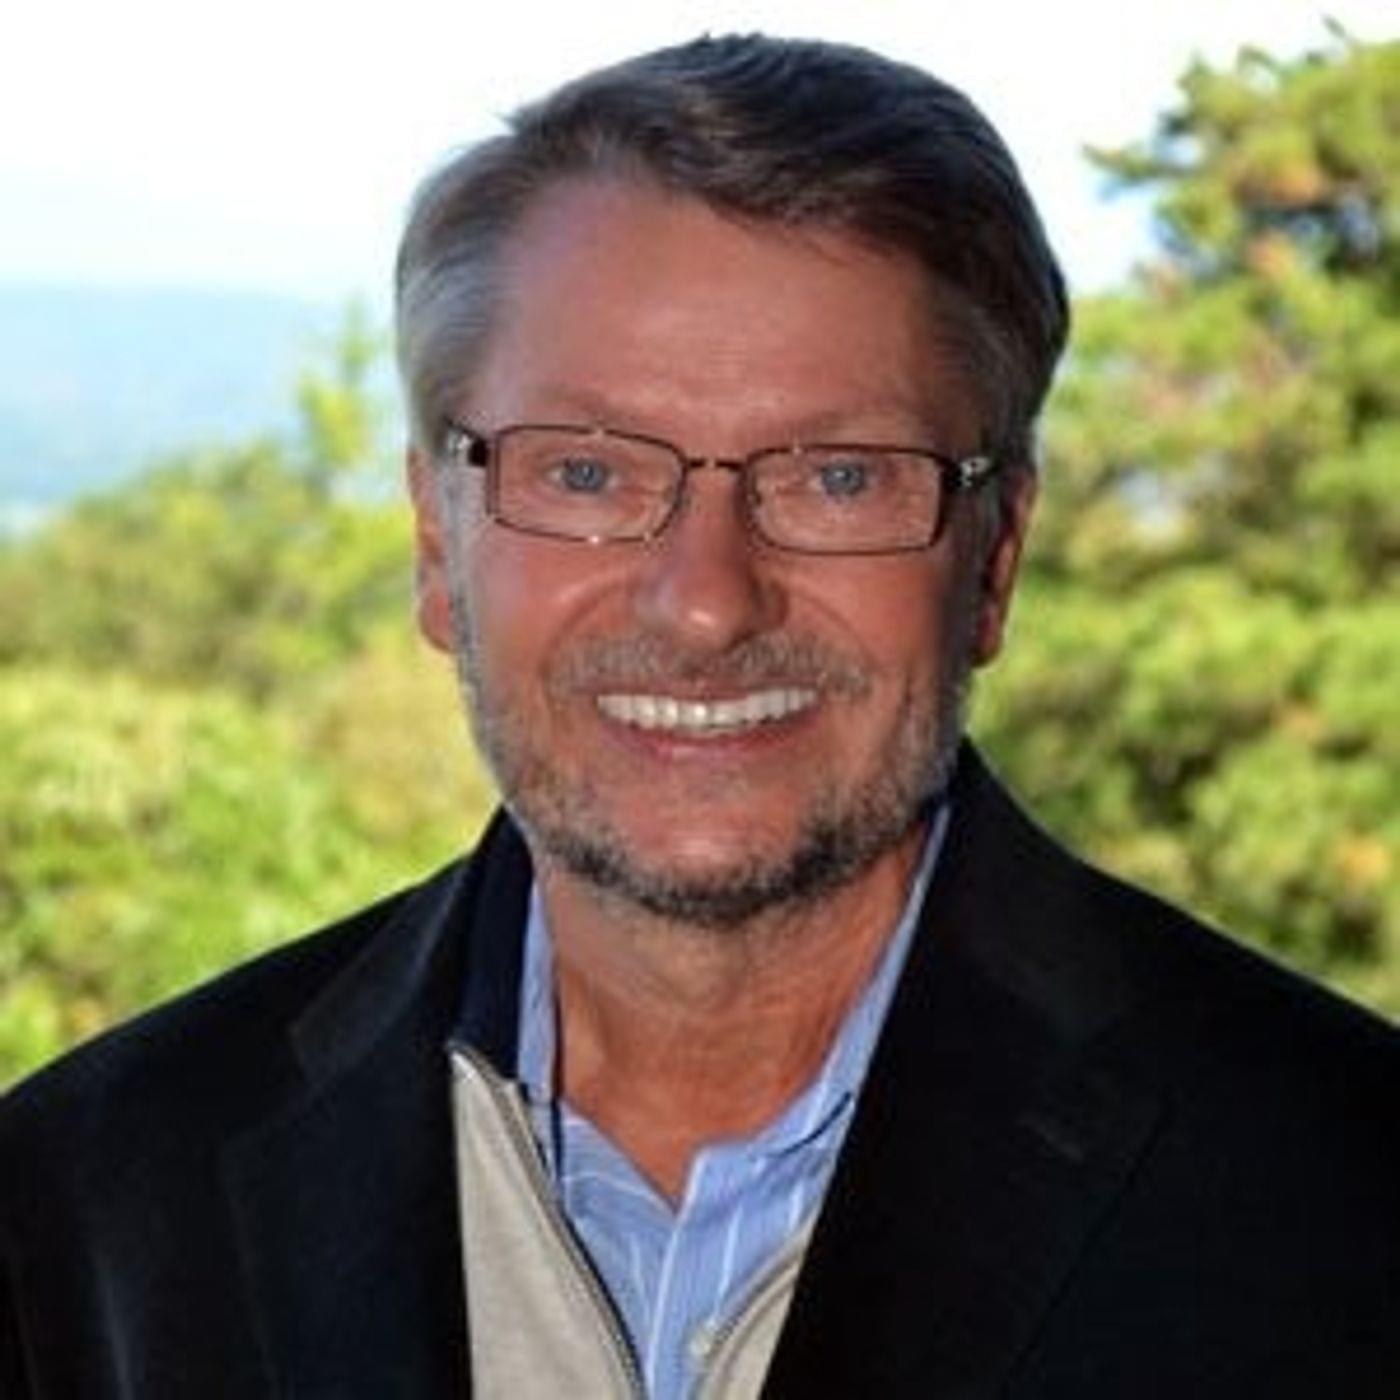 Michael F. Corbett